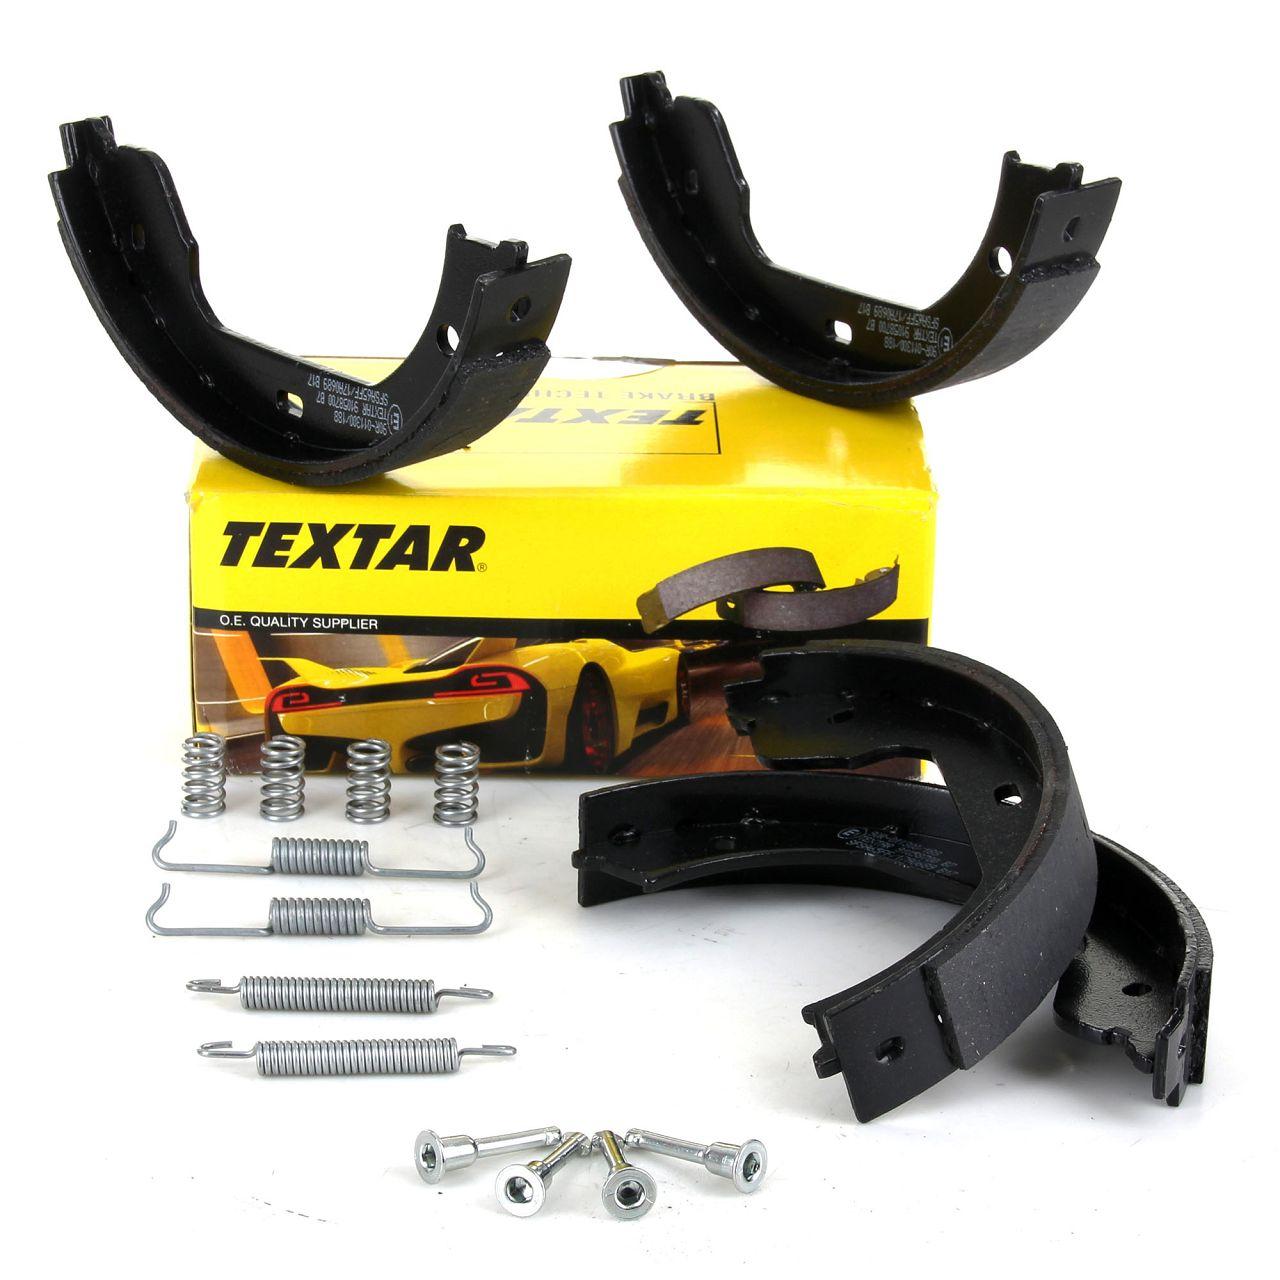 TEXTAR 91058700 Bremsbacken + Federn Satz BMW E46 M3 E60 E61 E65-67 F01-04 X3 X5 X6 hinten